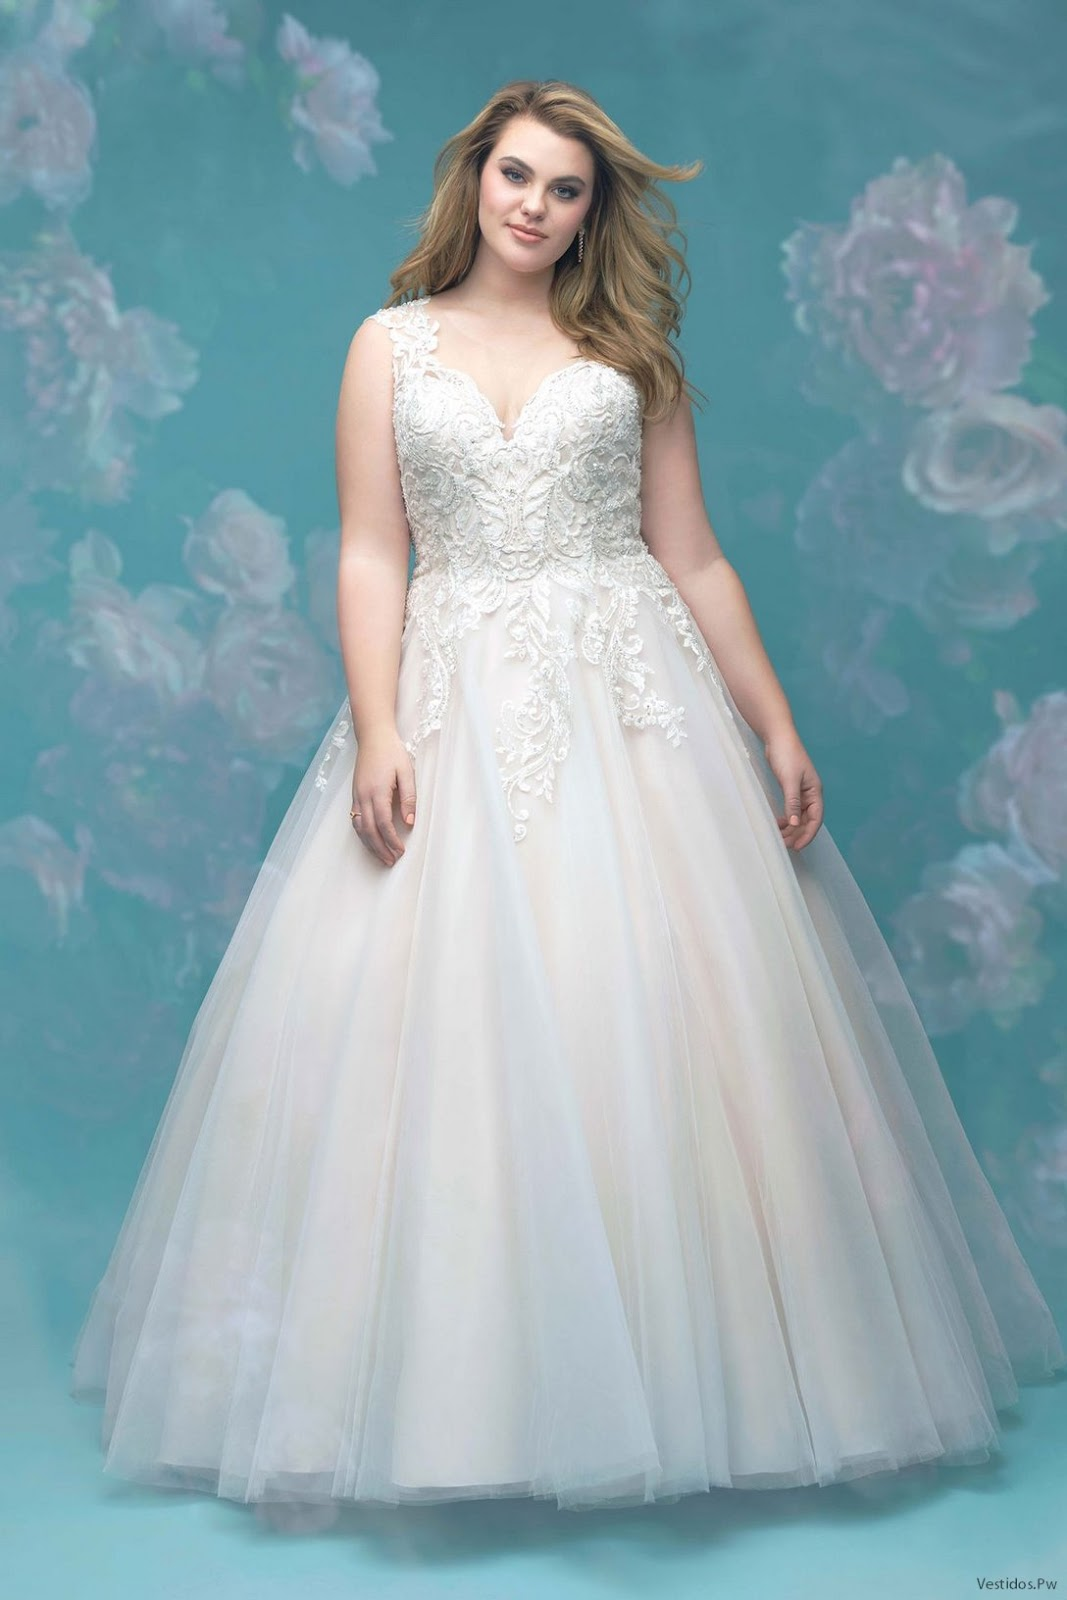 Amazing Vestidos De Novia Para Boda Civil Image - All Wedding ...